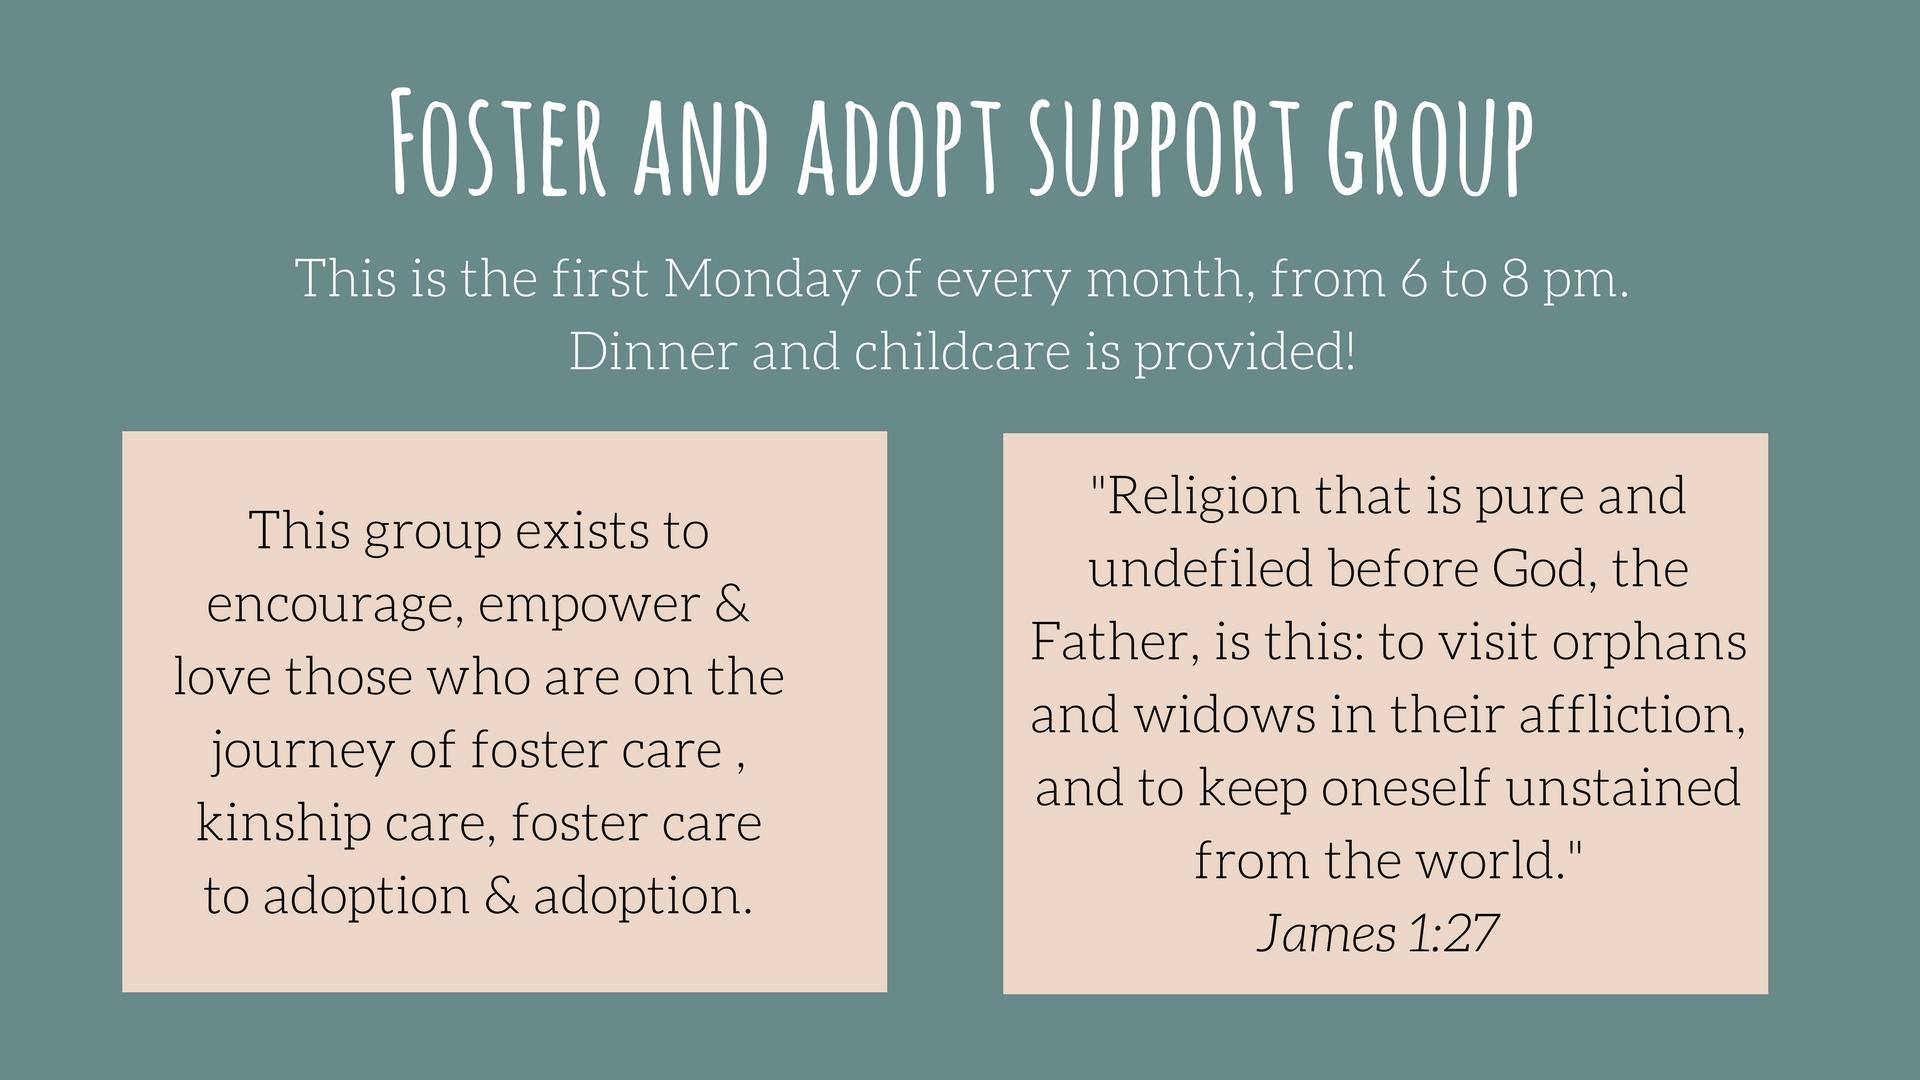 foster&support.jpg